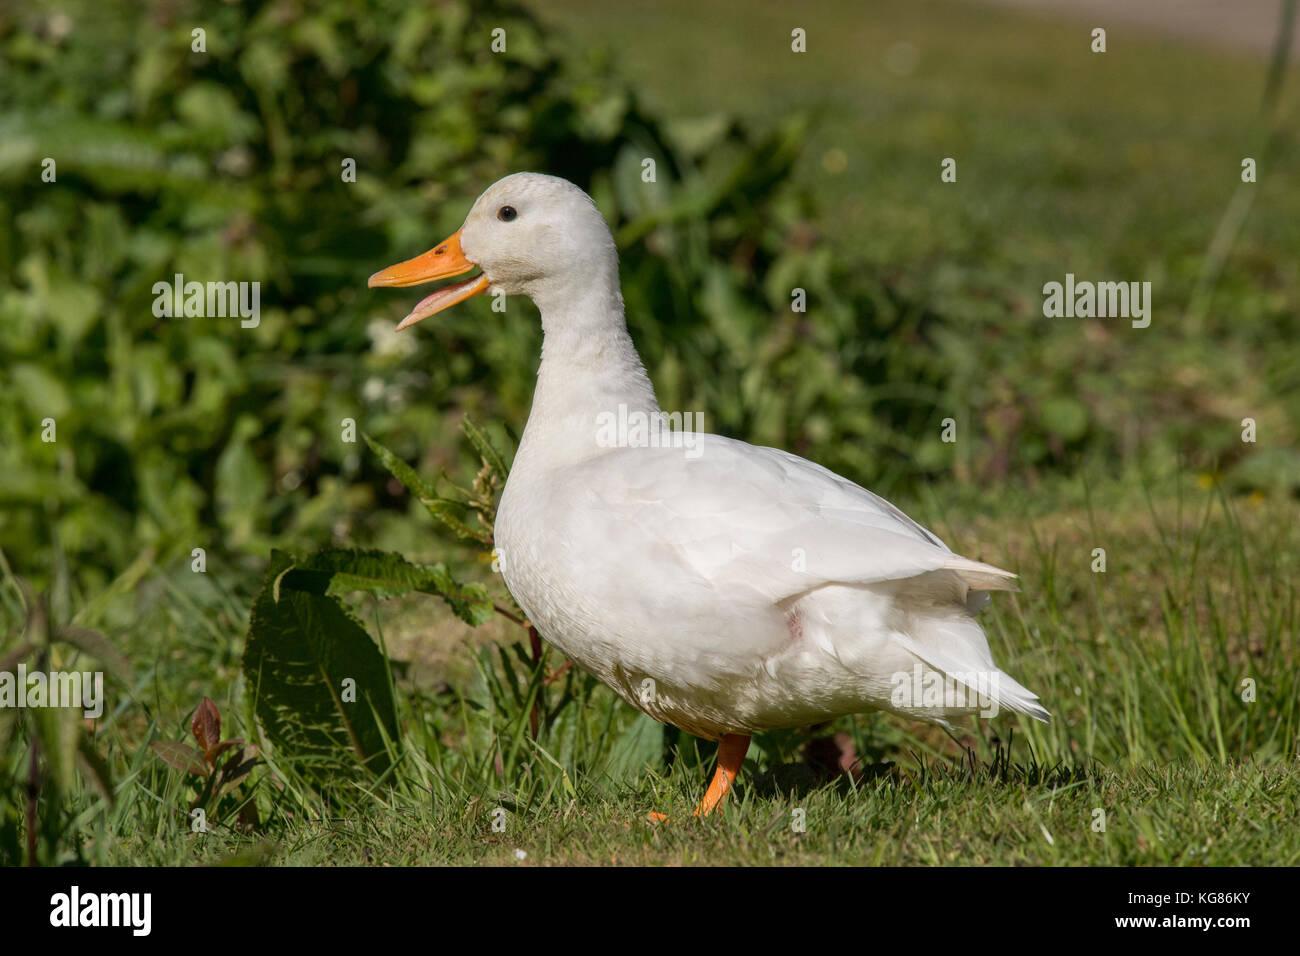 Pekin duck, on the grass, close up, quacking Stock Photo